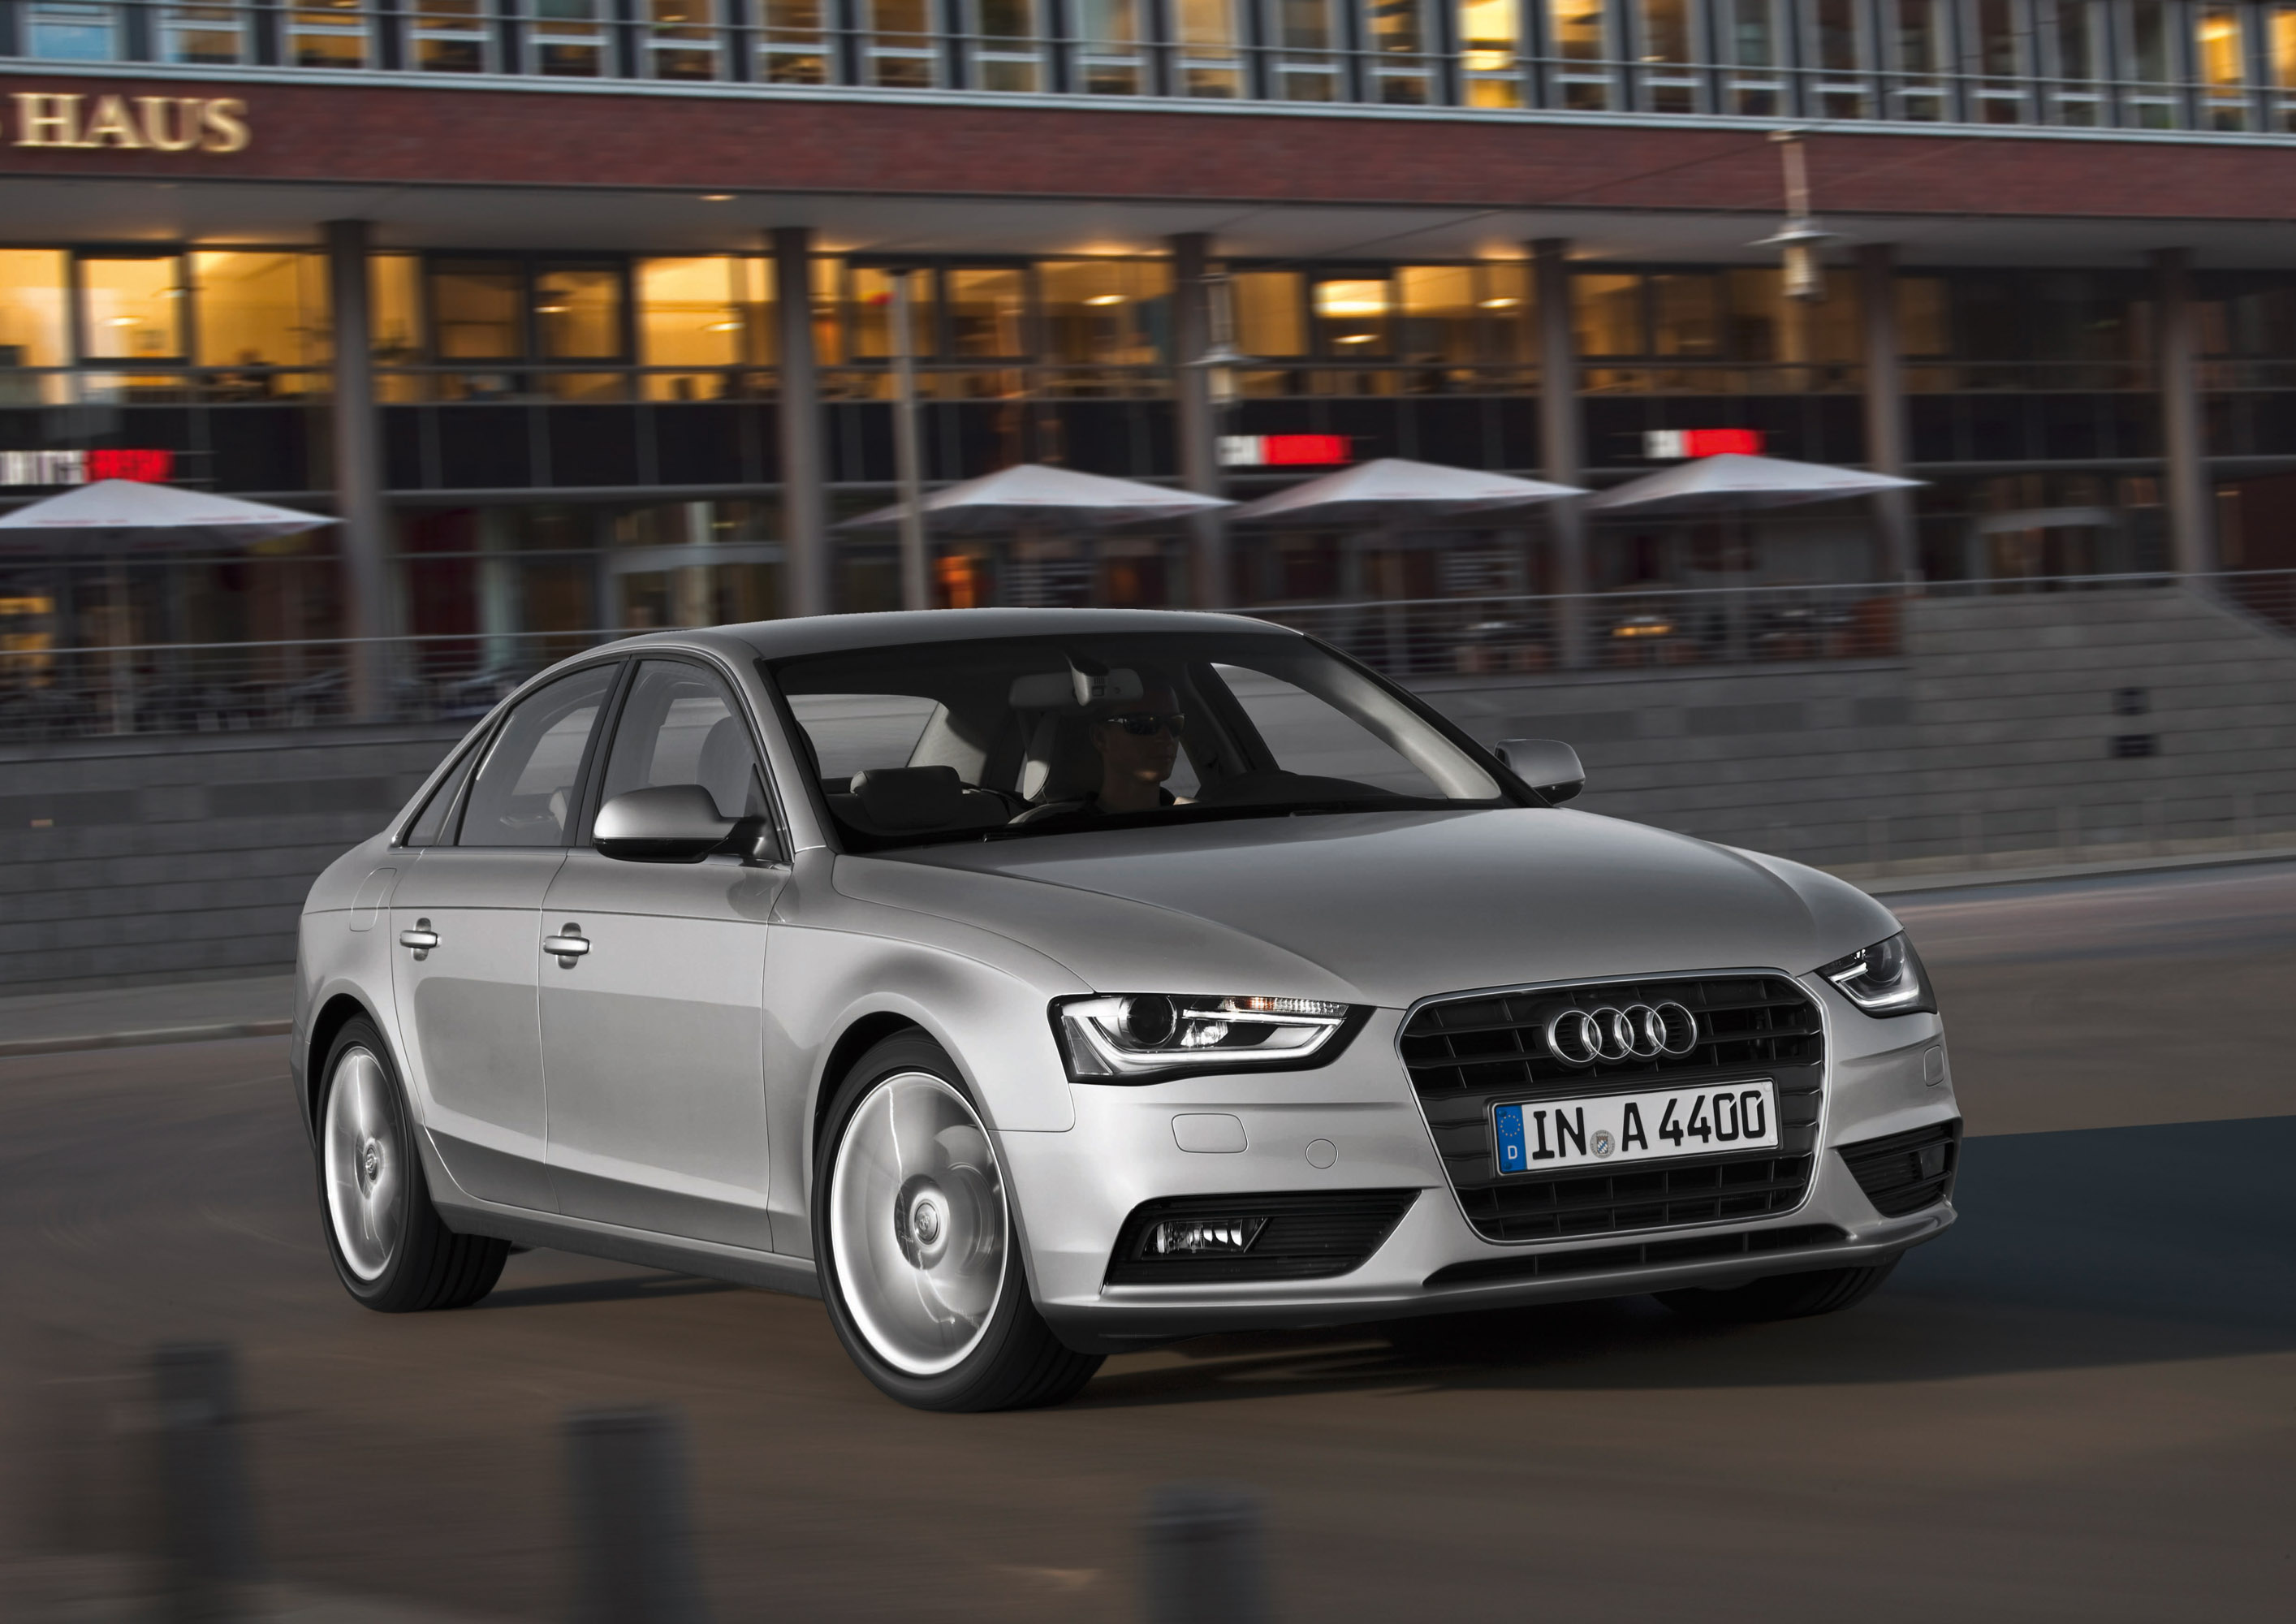 Kelebihan Audi A4 1.8 Murah Berkualitas